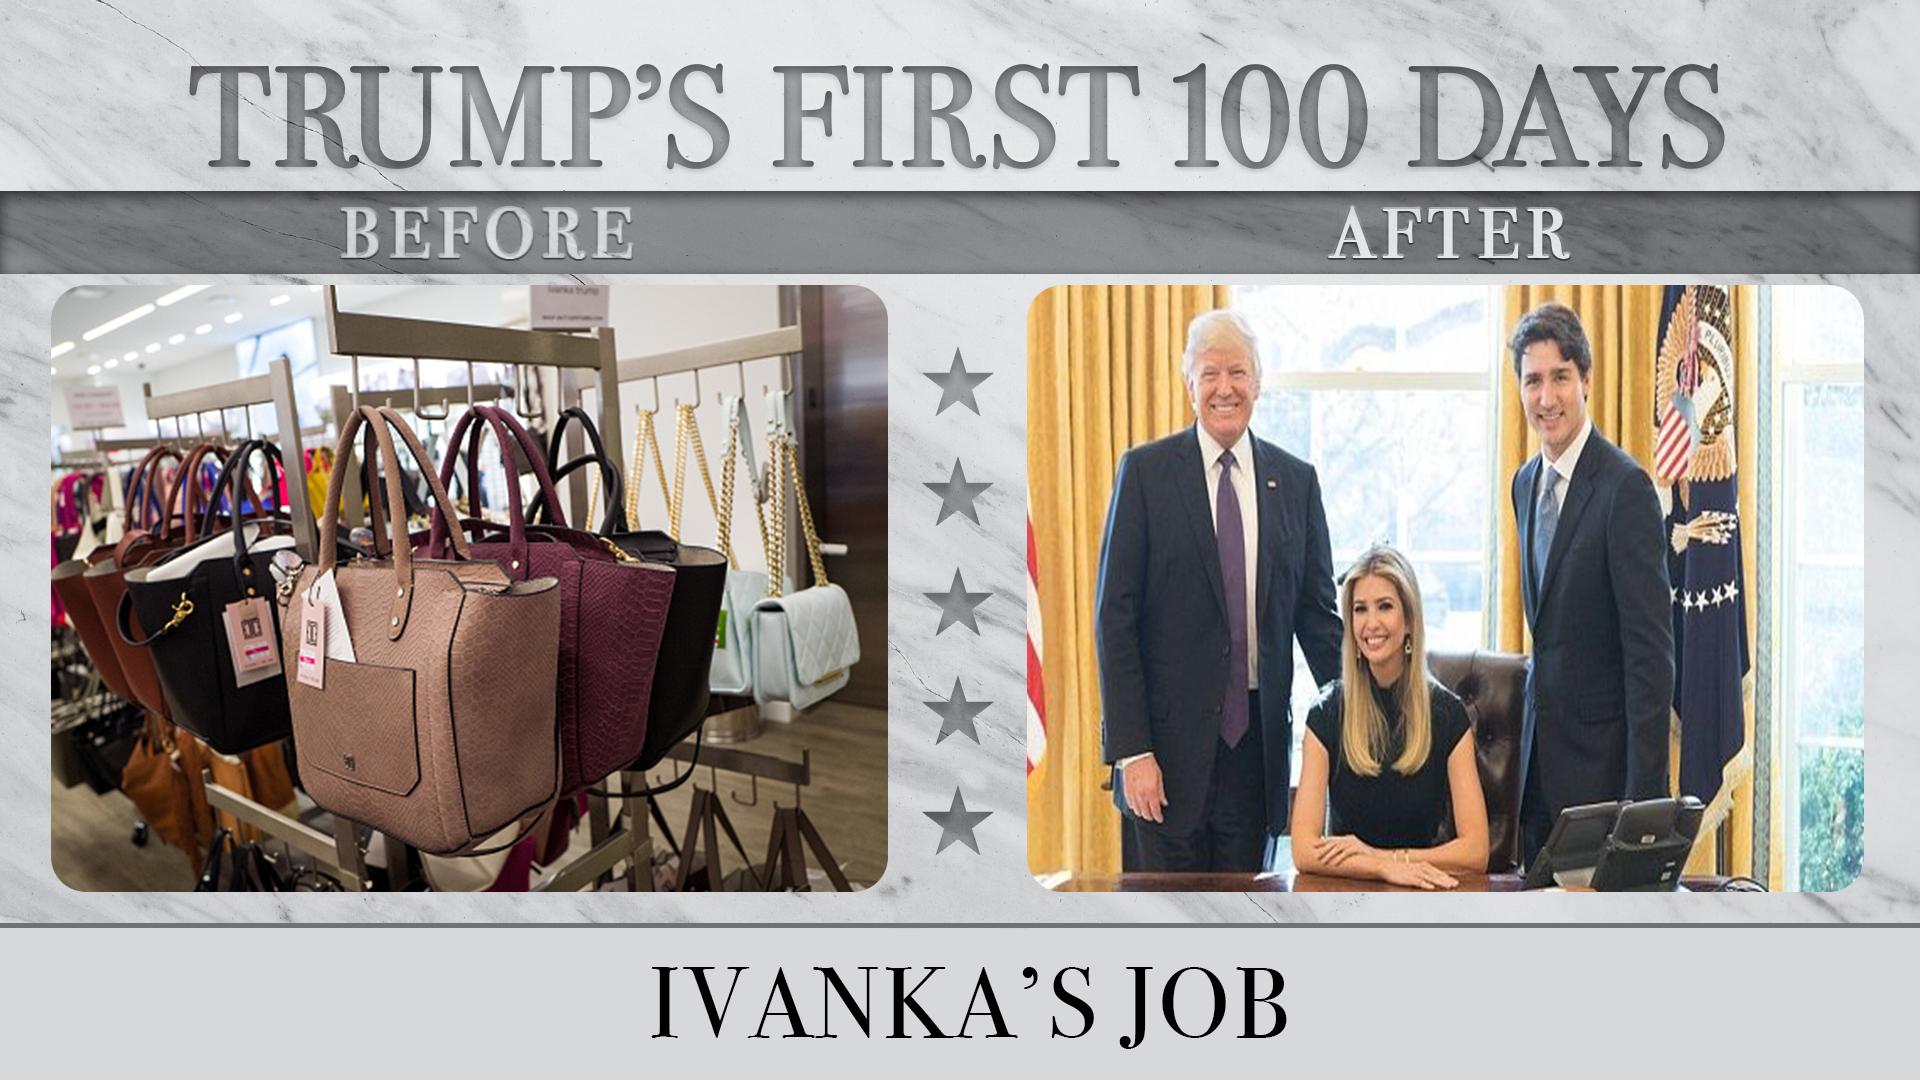 Ivanka's Job